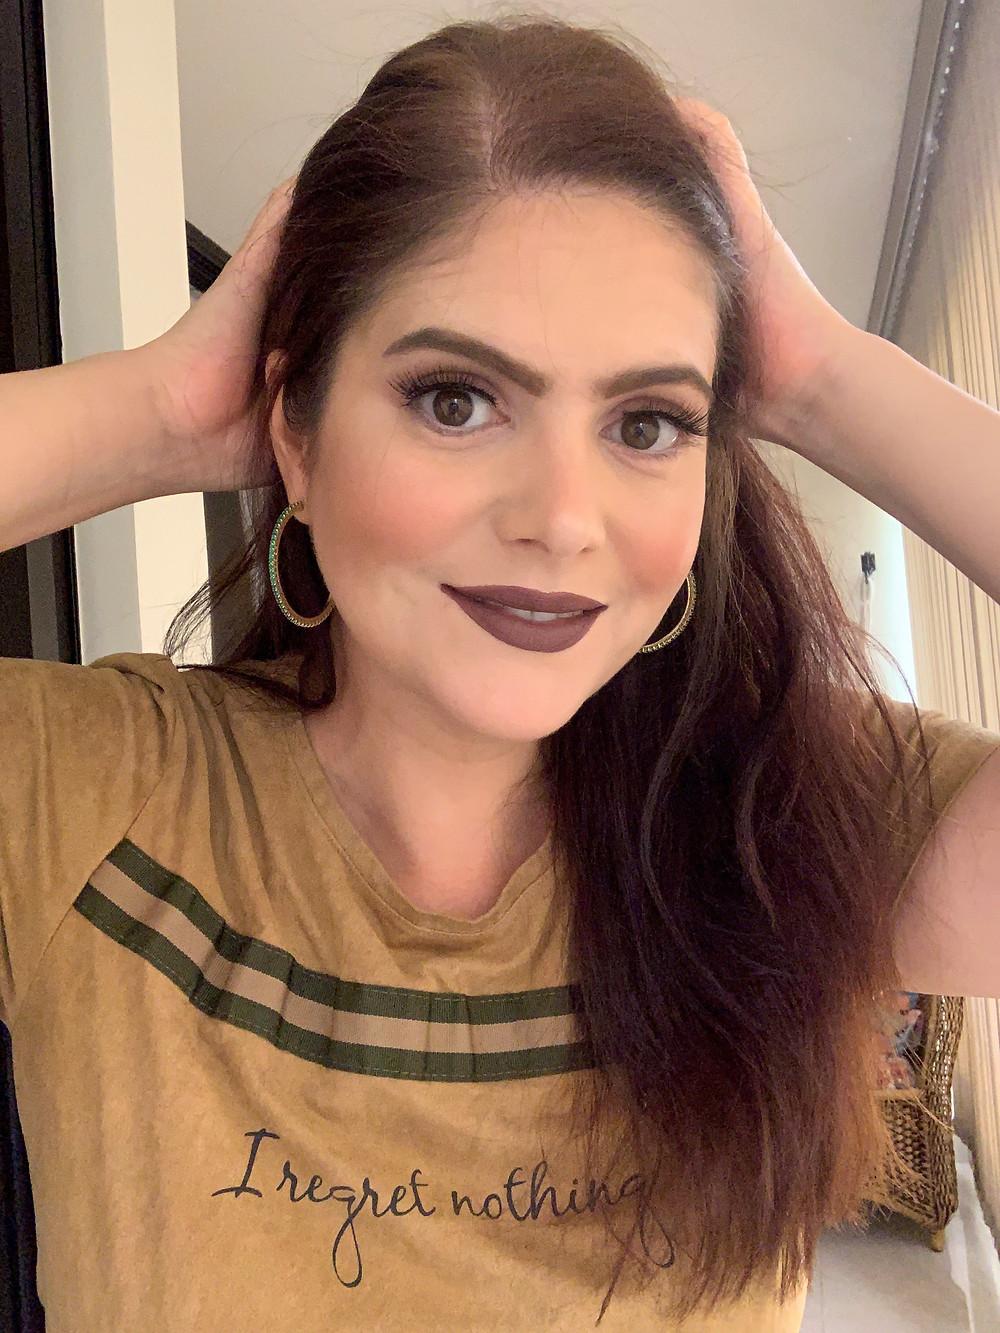 Primer Lágrimas Mágicas Unicórnio | Face Beautiful Profissional